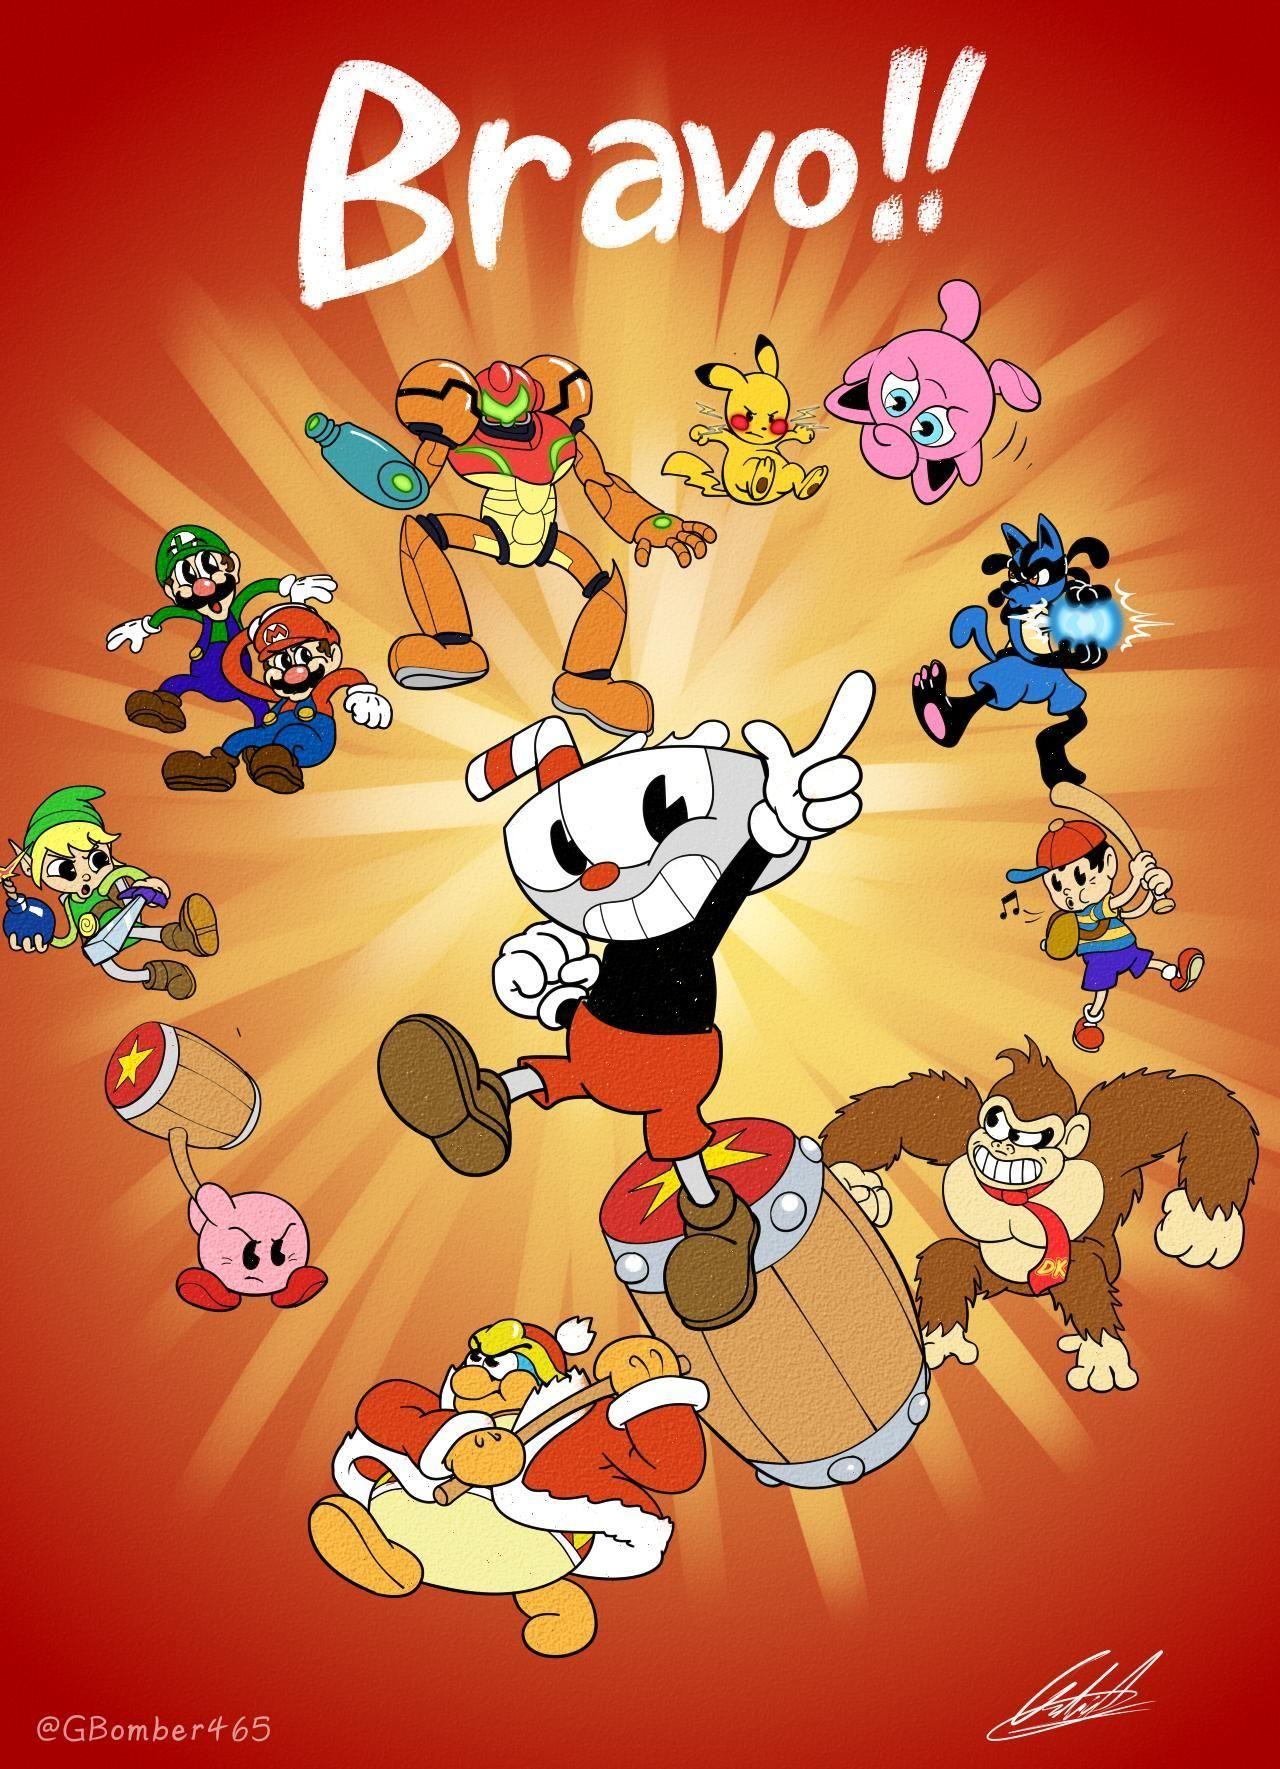 A Good Day For A Smash Battle Super Smash Brothers Ultimate Nintendo Super Smash Bros Super Smash Bros Memes Super Smash Brothers